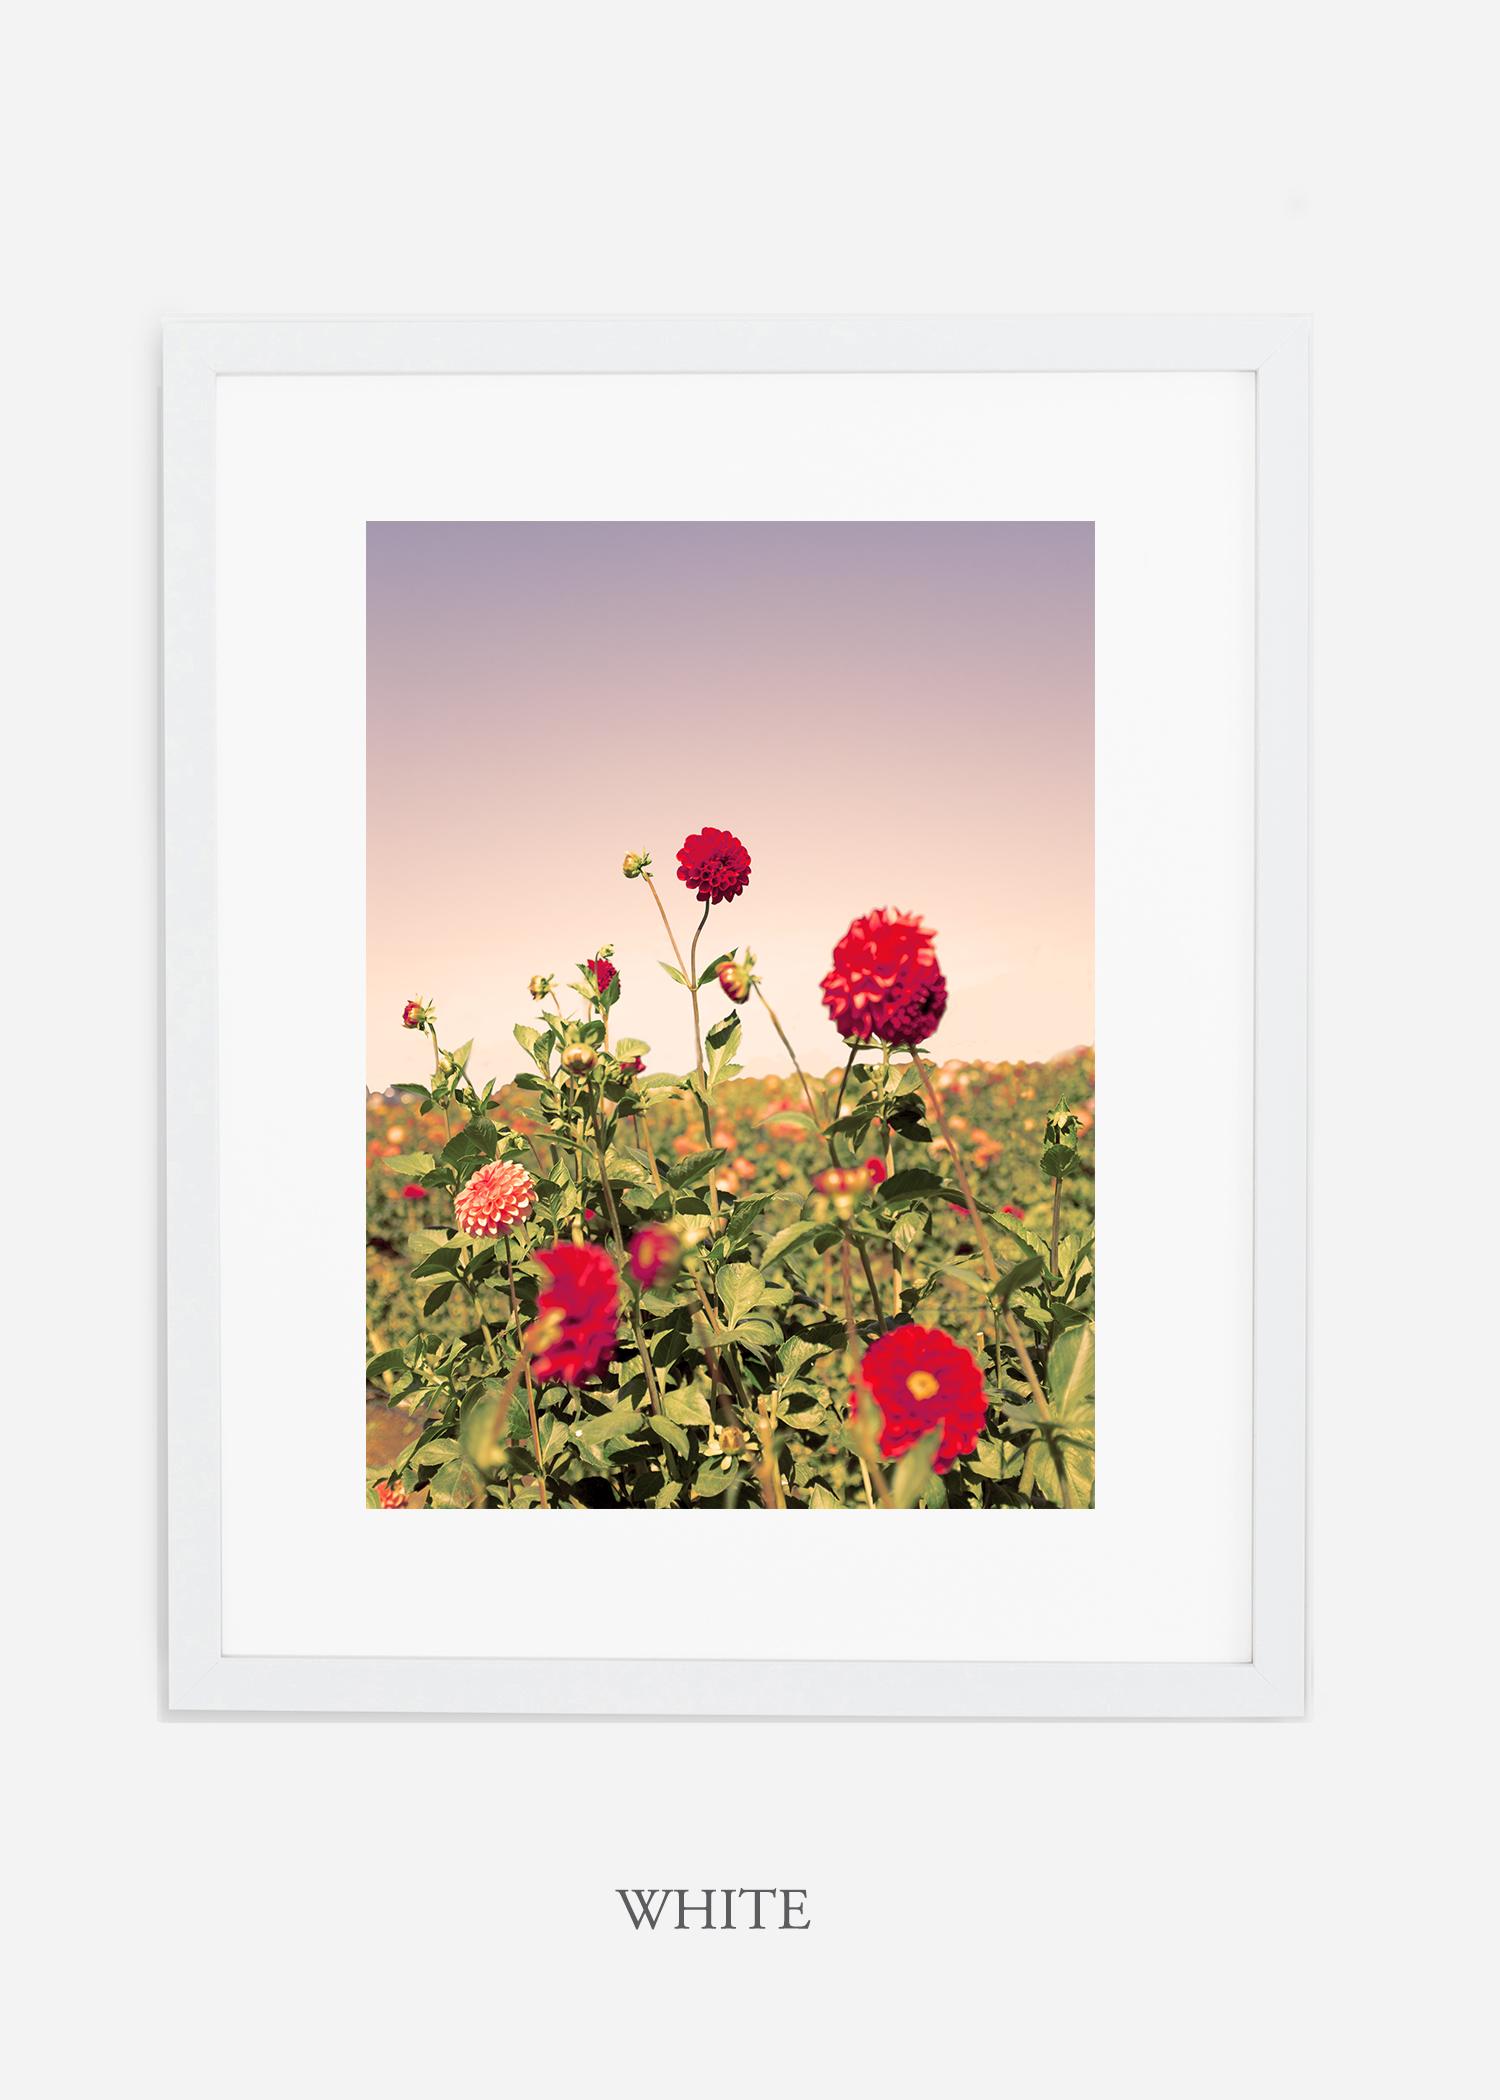 DahliaNo.8-white-frame-mat-interior-design-botanical-print-art-wilder-california-wilder-paper.jpg